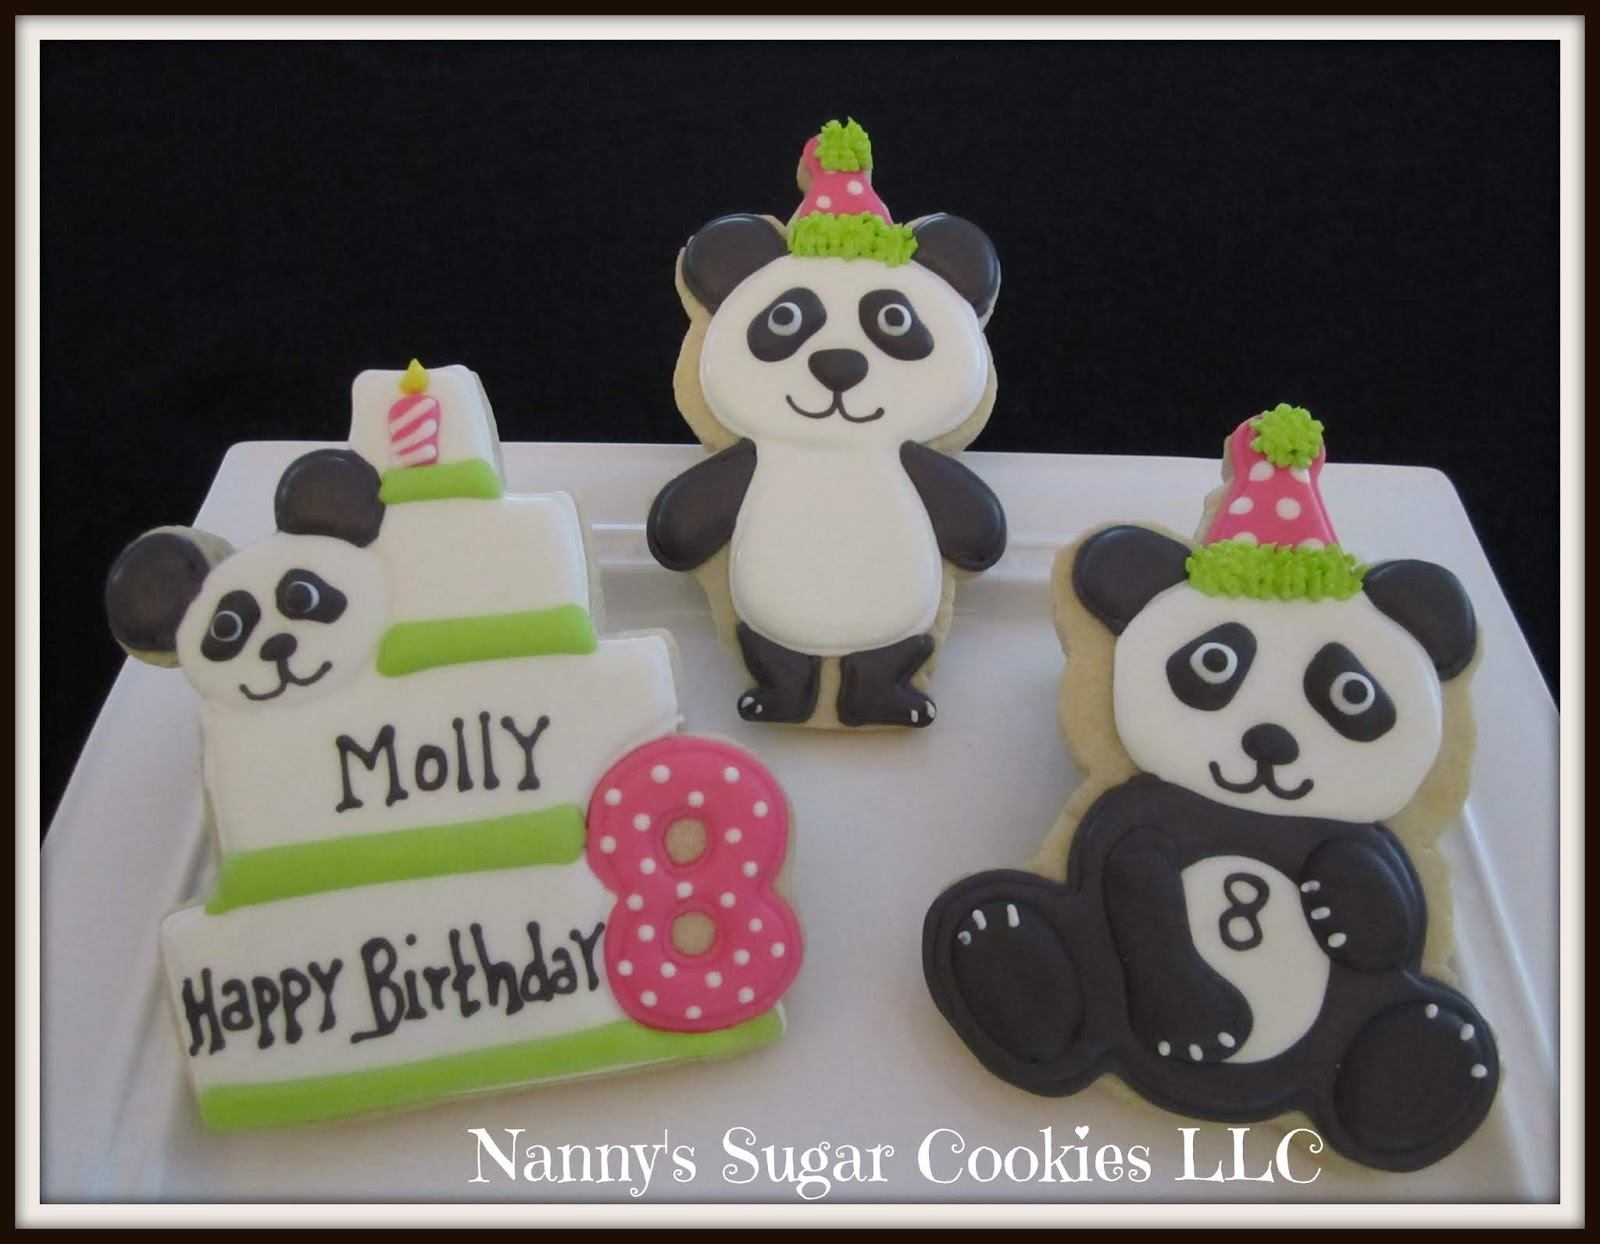 Superb Nannys Sugar Cookies Llc Birthday Cake Panda Bears Funny Birthday Cards Online Inifofree Goldxyz